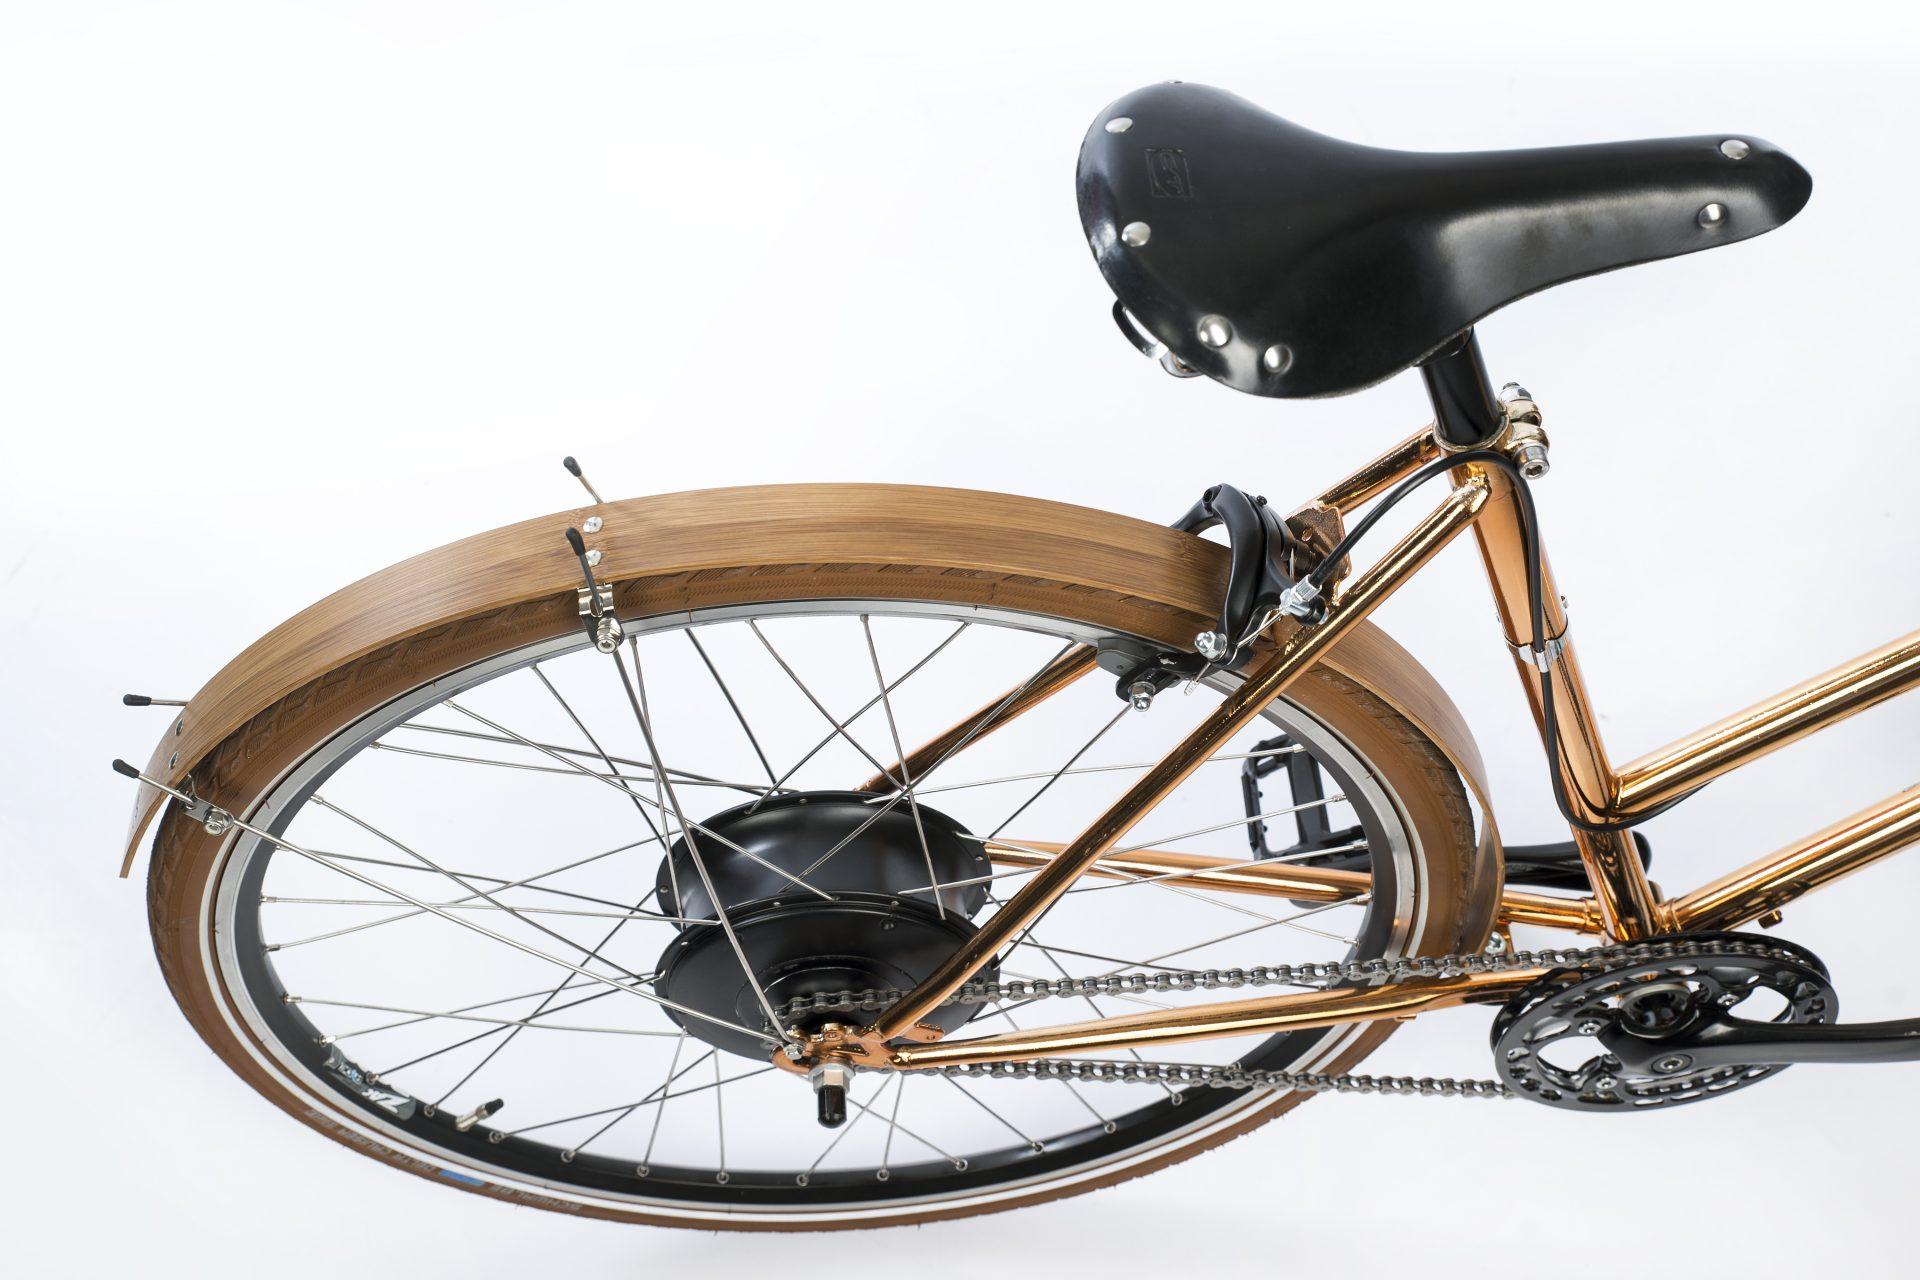 Republic Dutch | E-bike | Lady | Custom made bicycle